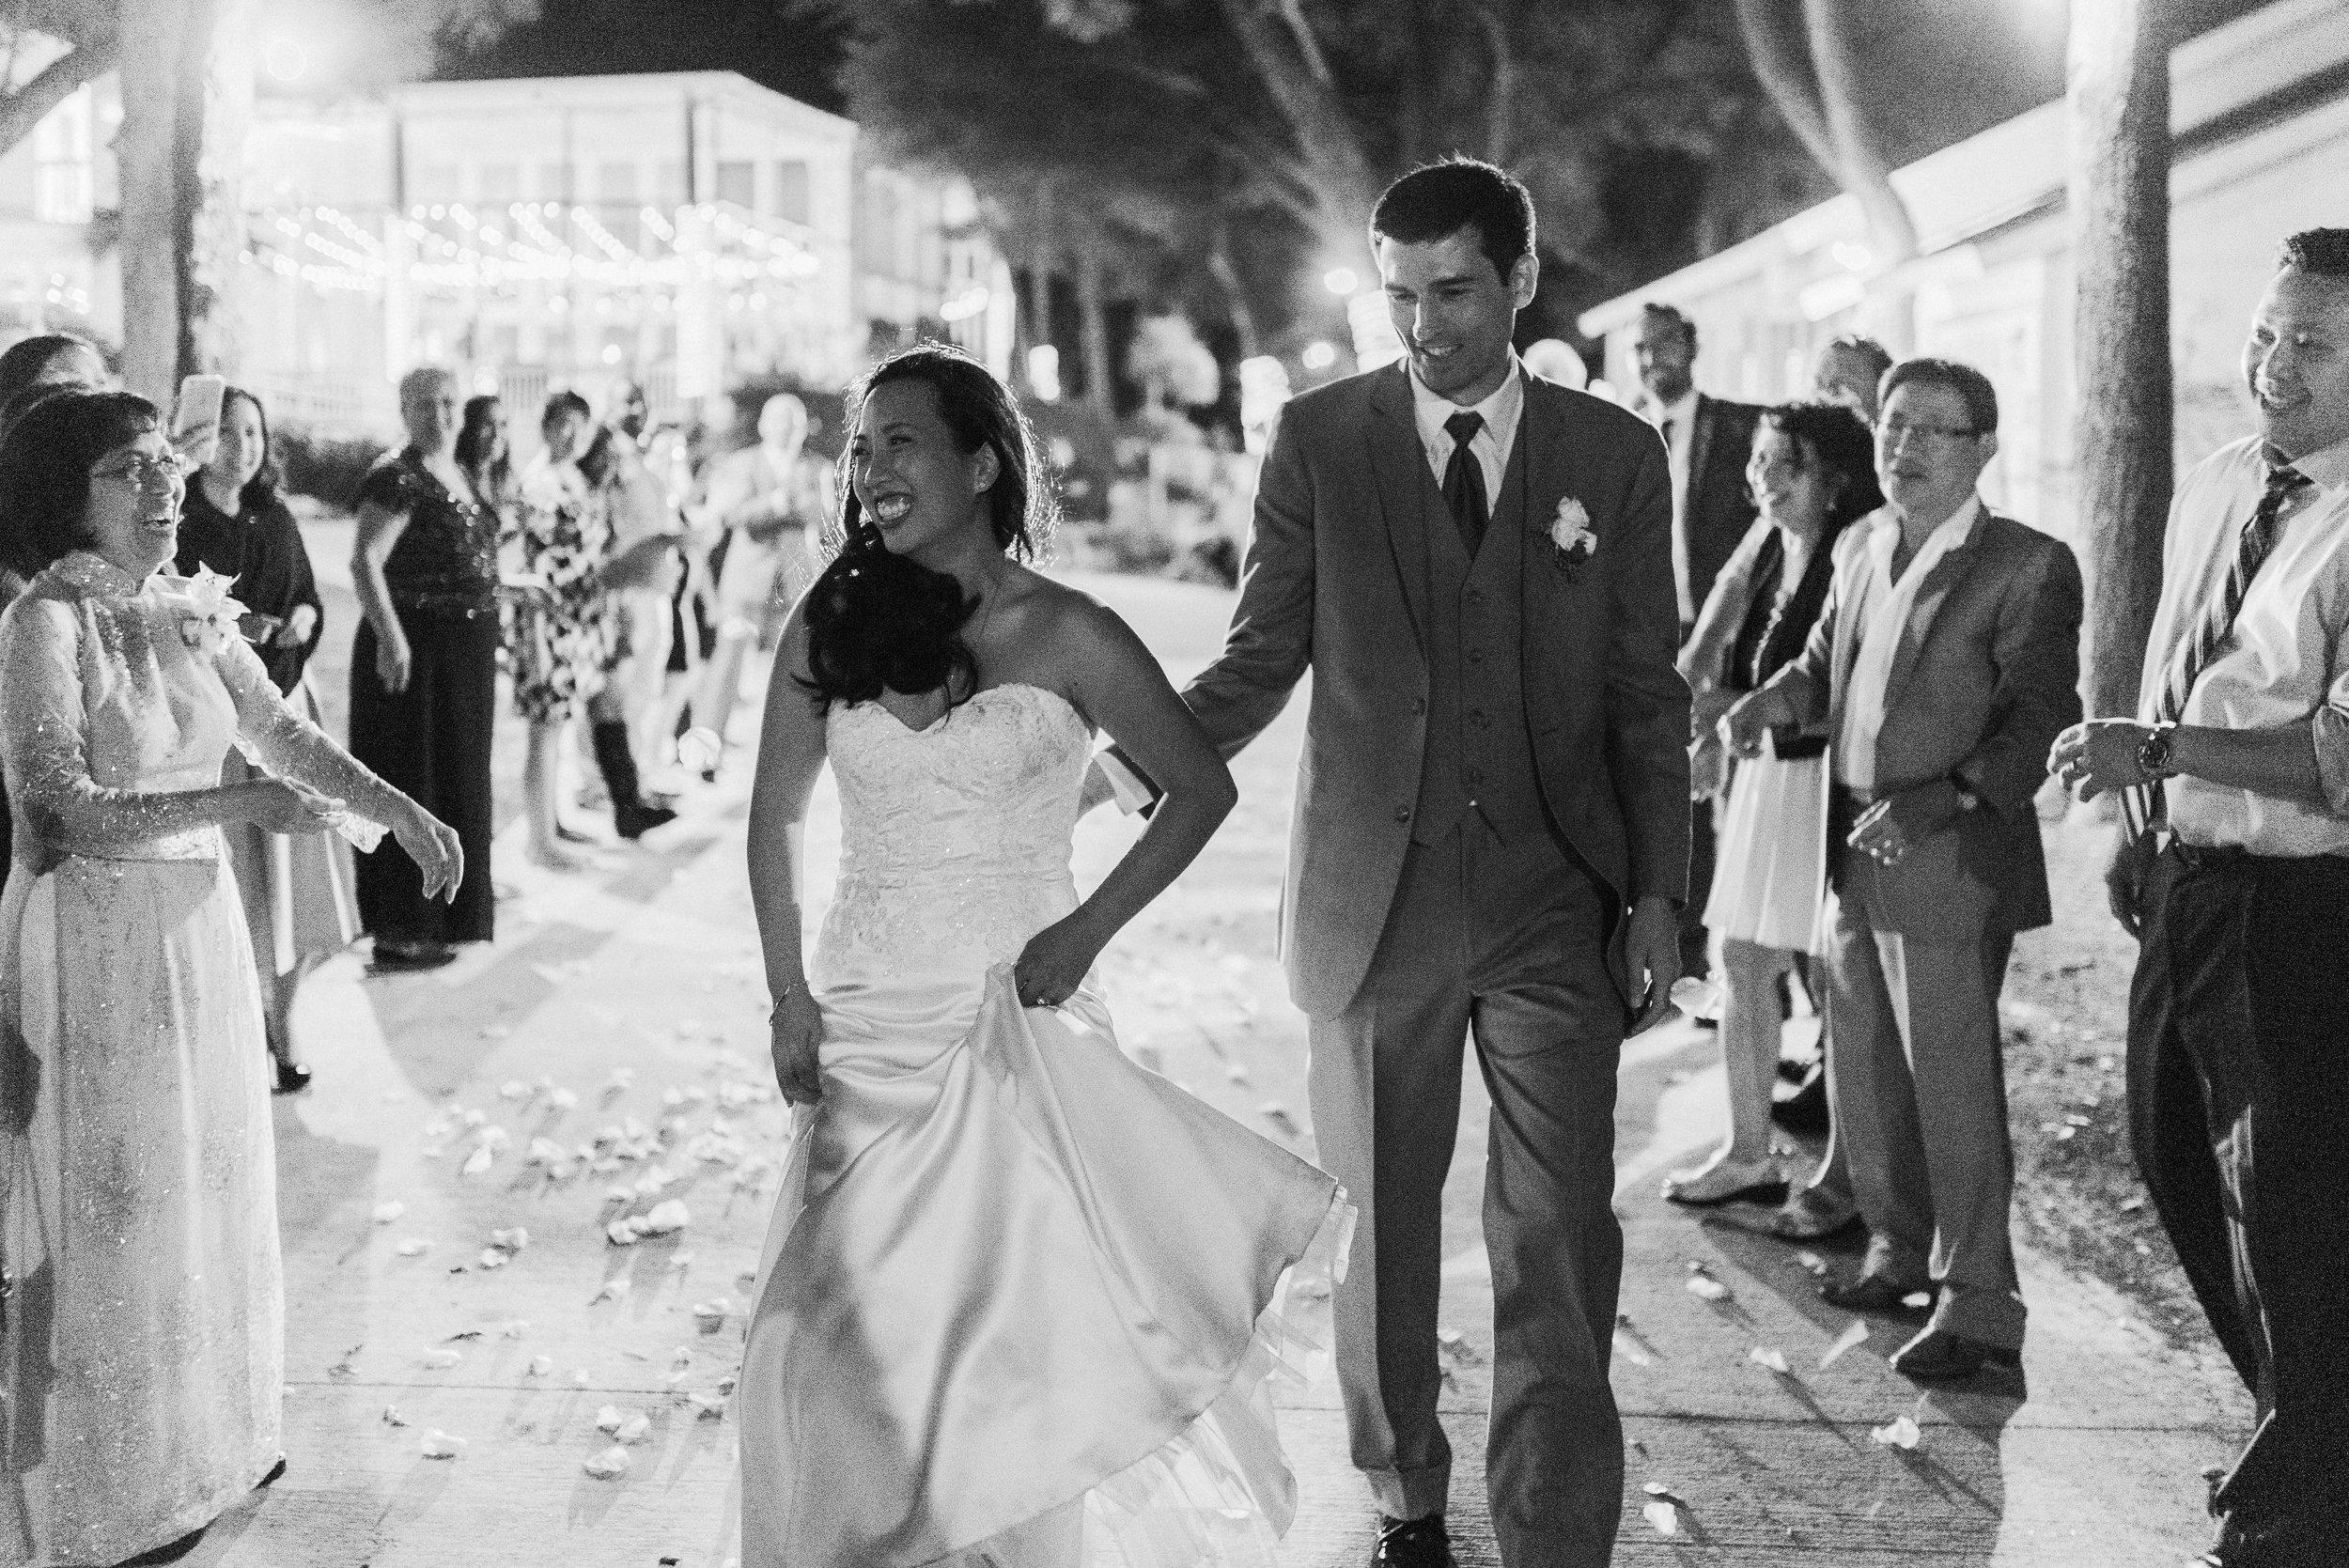 Mr. & Mrs. LeBranche - 248.jpg